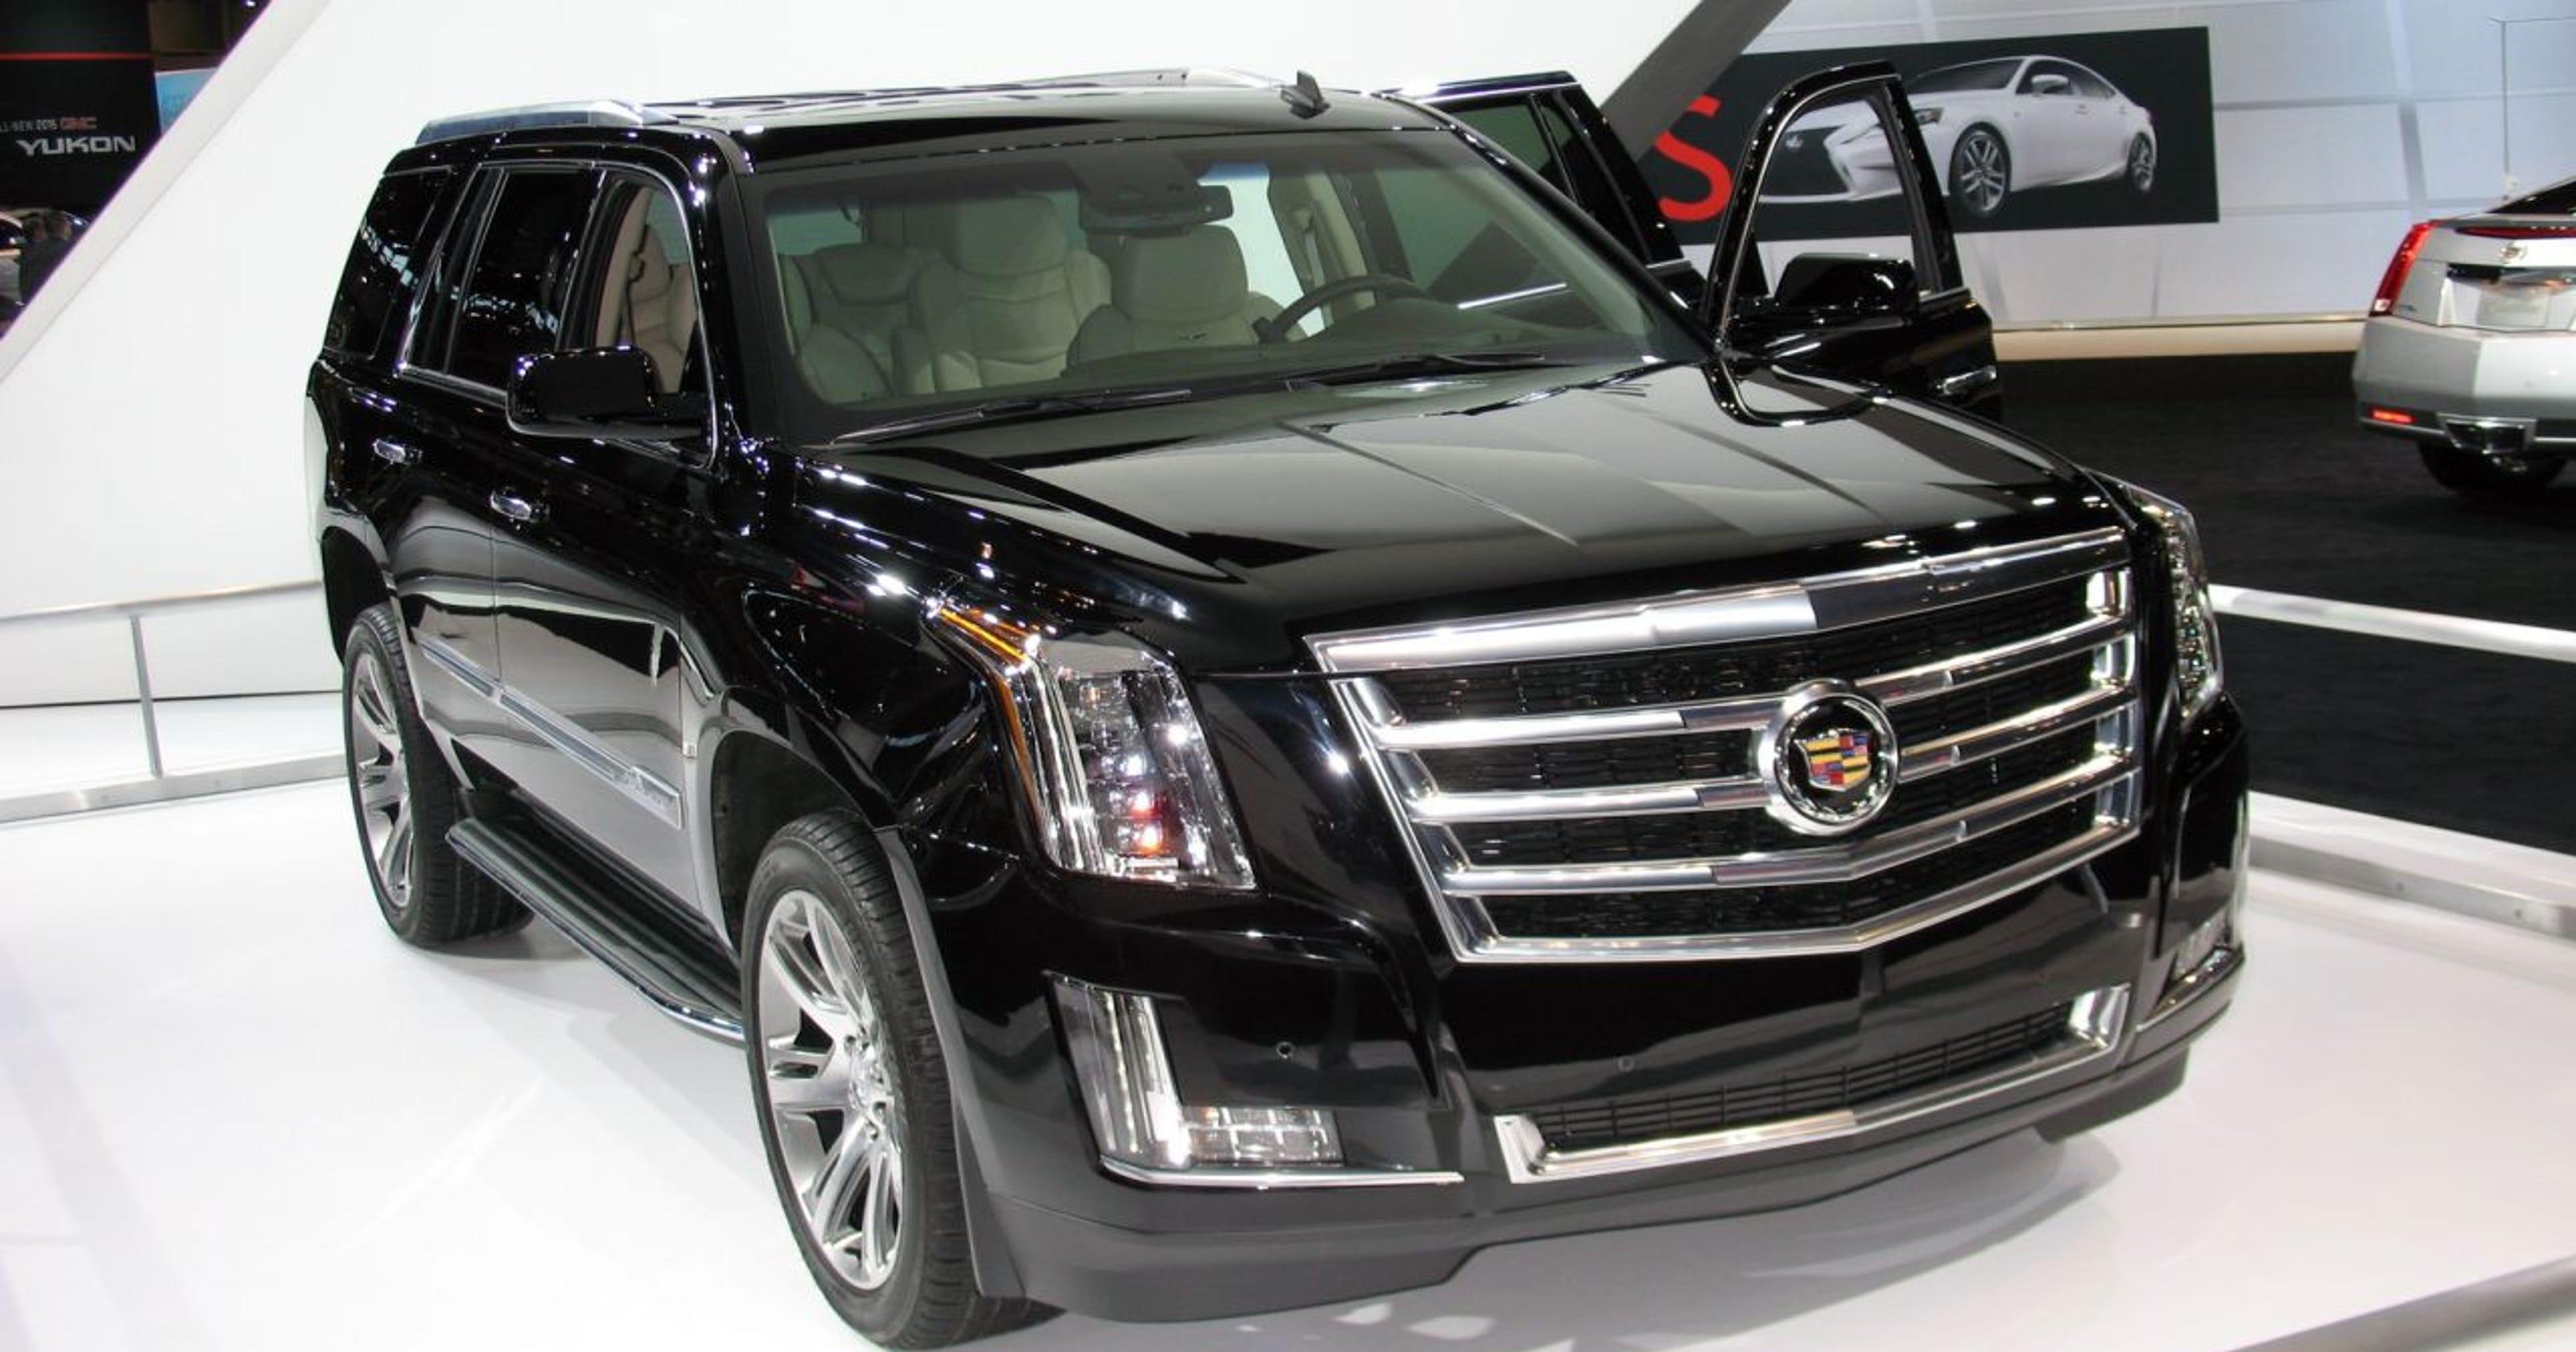 Precise Craftsmanship 2015 Cadillac Escalade Suv